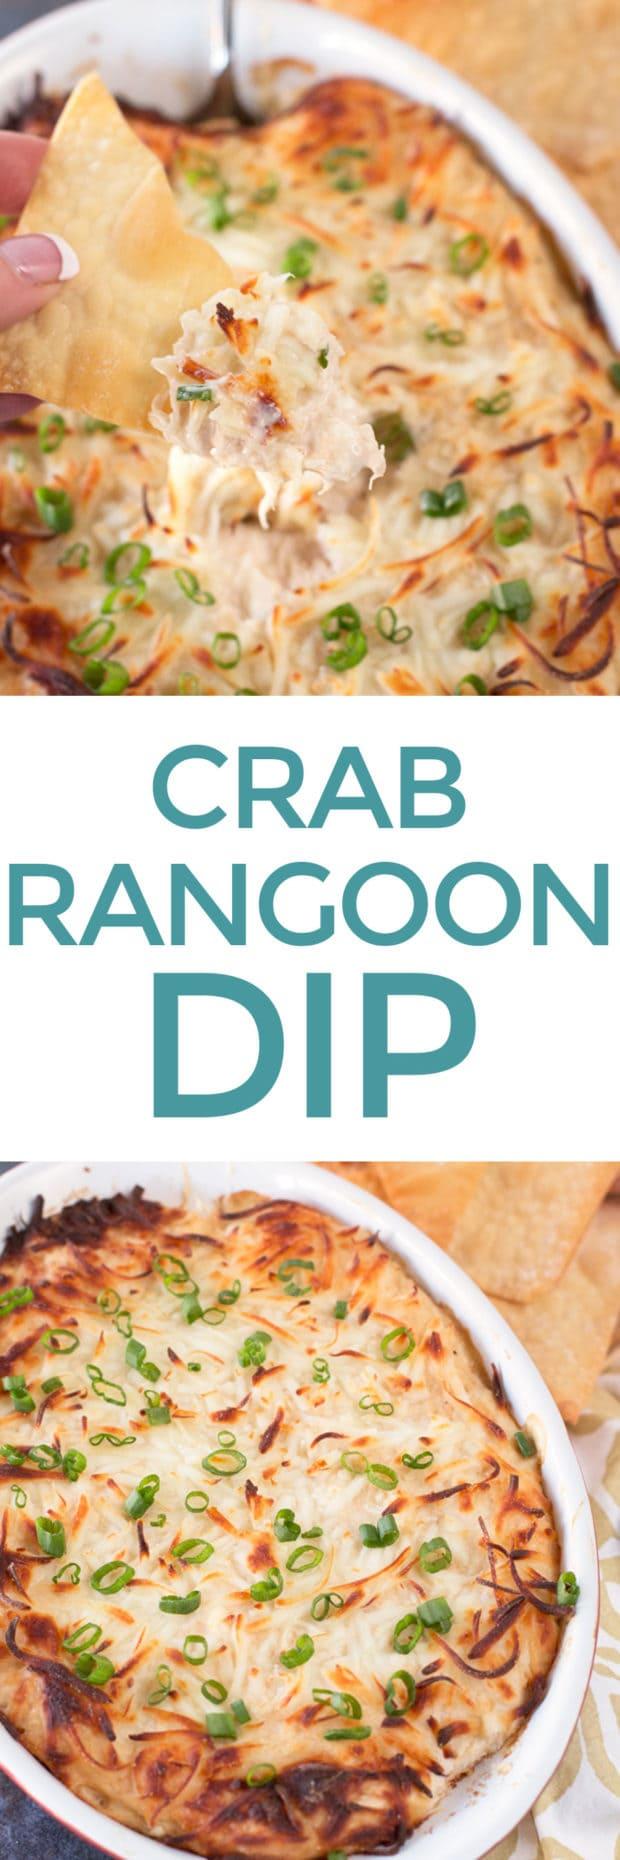 Crab Rangoon Dip | cakenknife.com